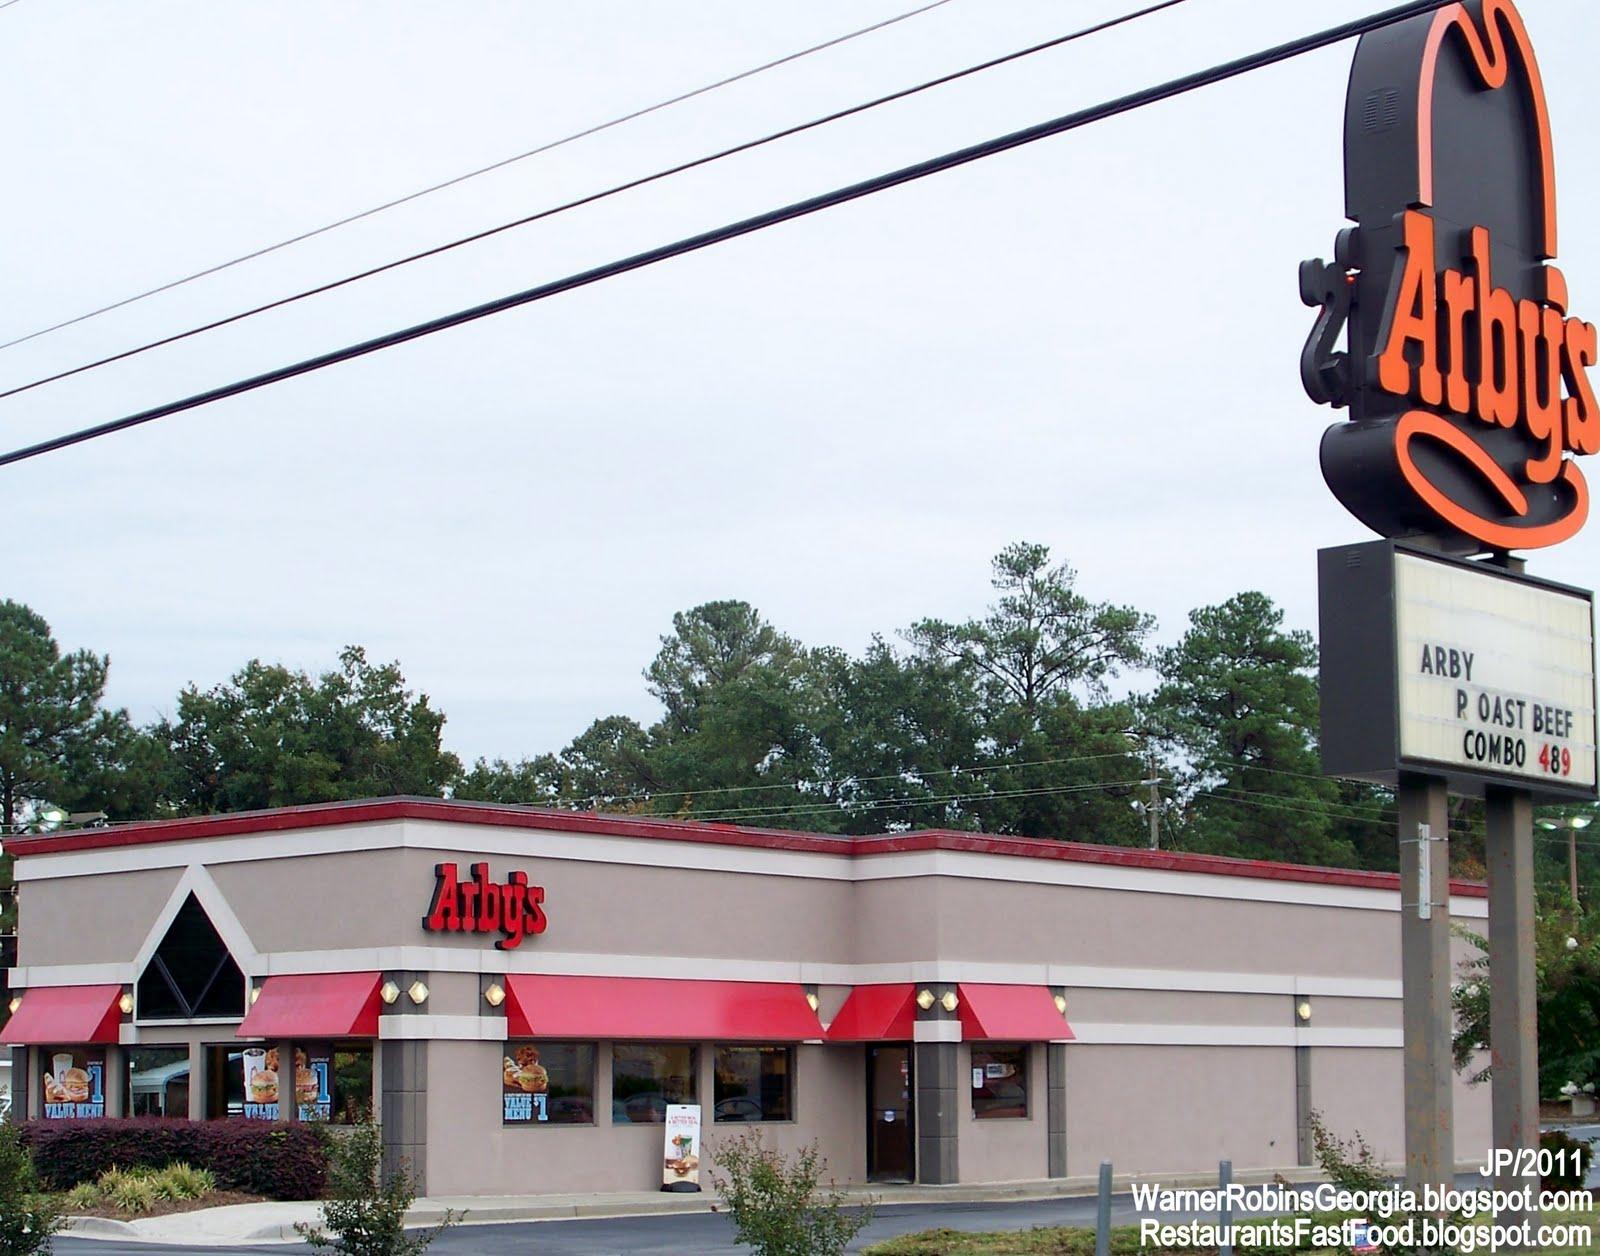 Arby S Warner Robins Georgia Watson Blvd Roast Beef Sandwich Fast Food Restaurant Ga